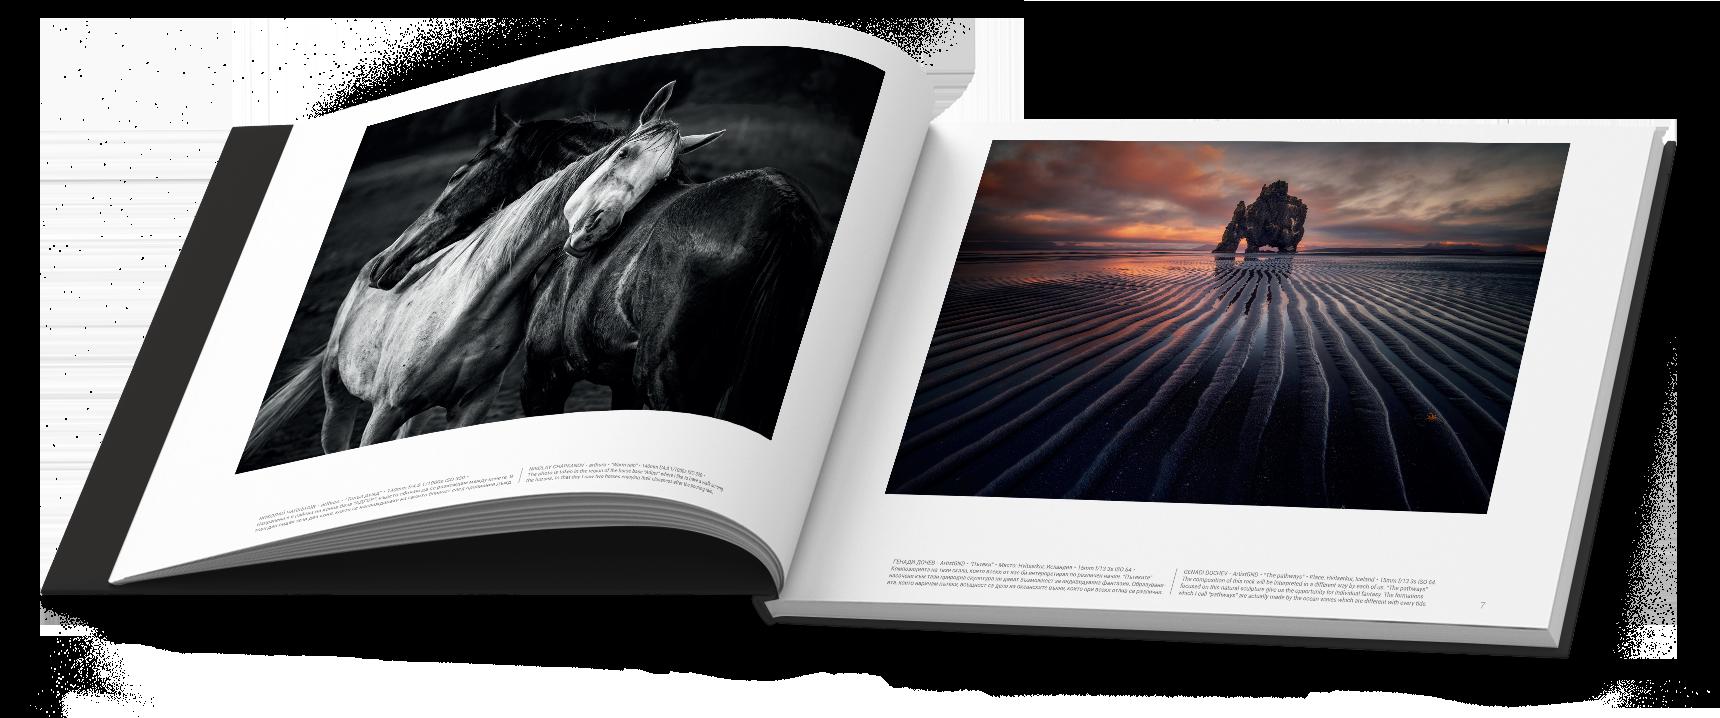 Фотографски Албум 2018 г. - Black&White &Color - страници 6-7